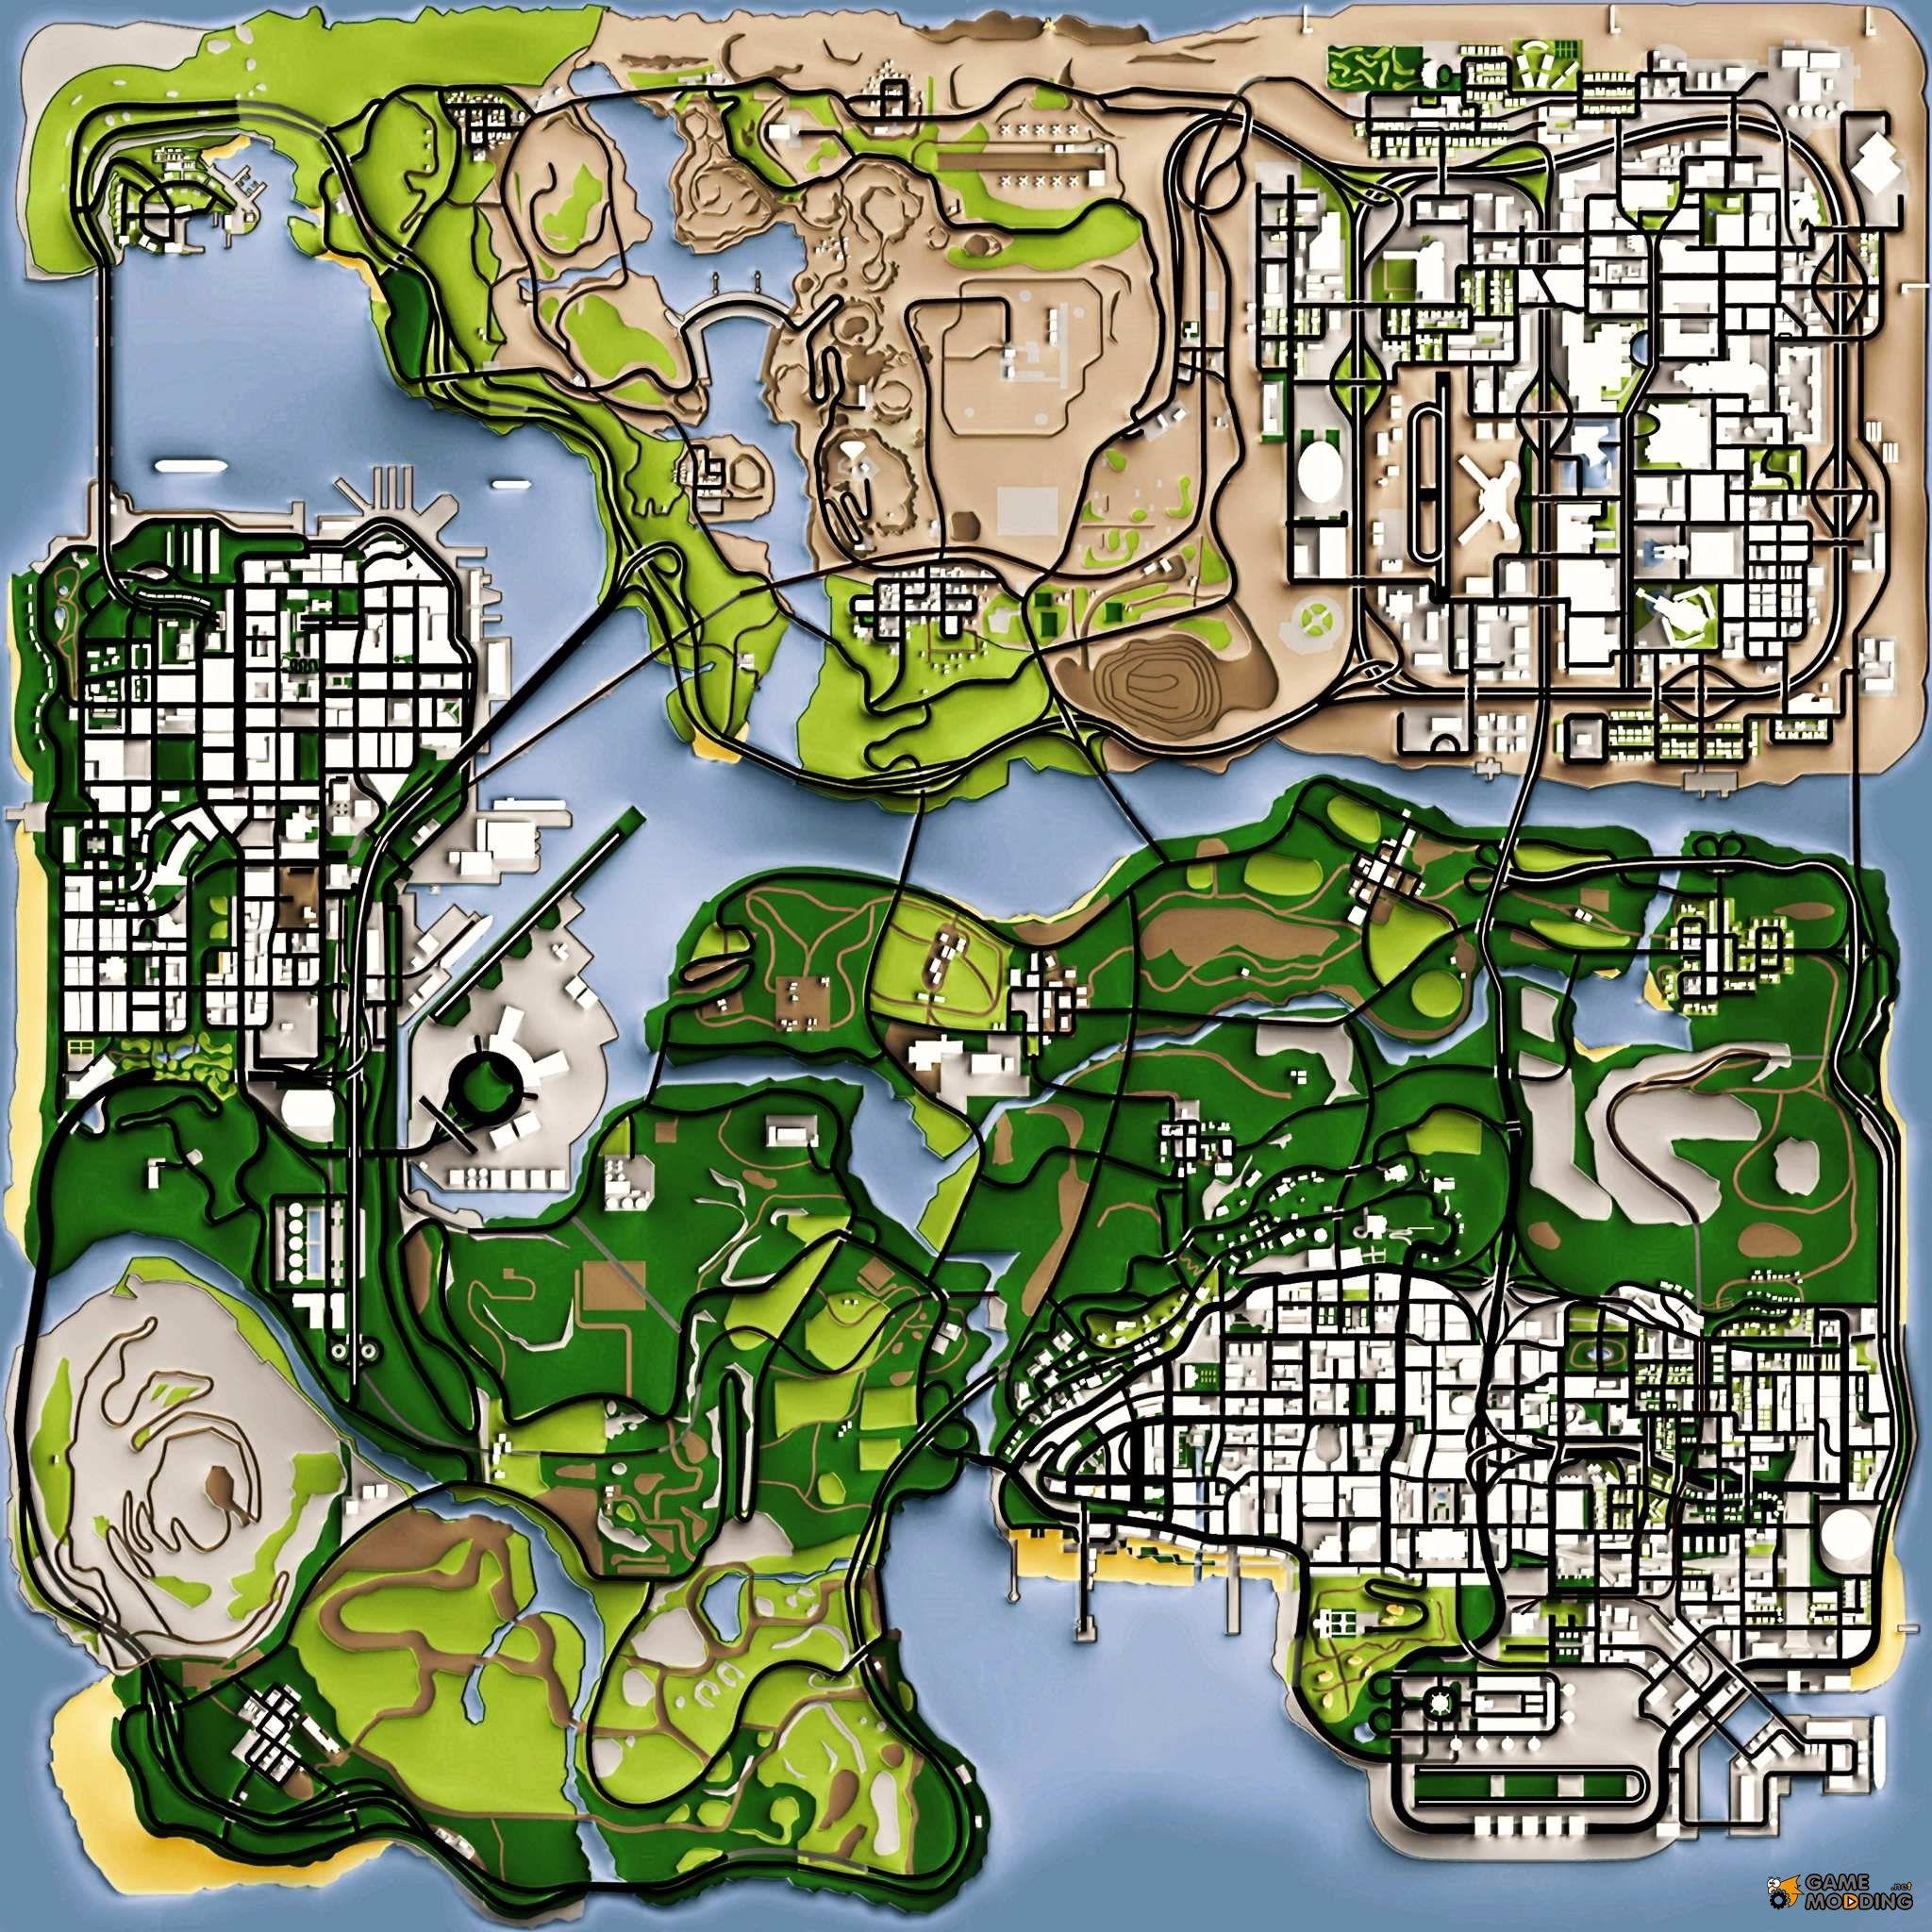 maps for gta san andreas latestgames pinterest. Black Bedroom Furniture Sets. Home Design Ideas